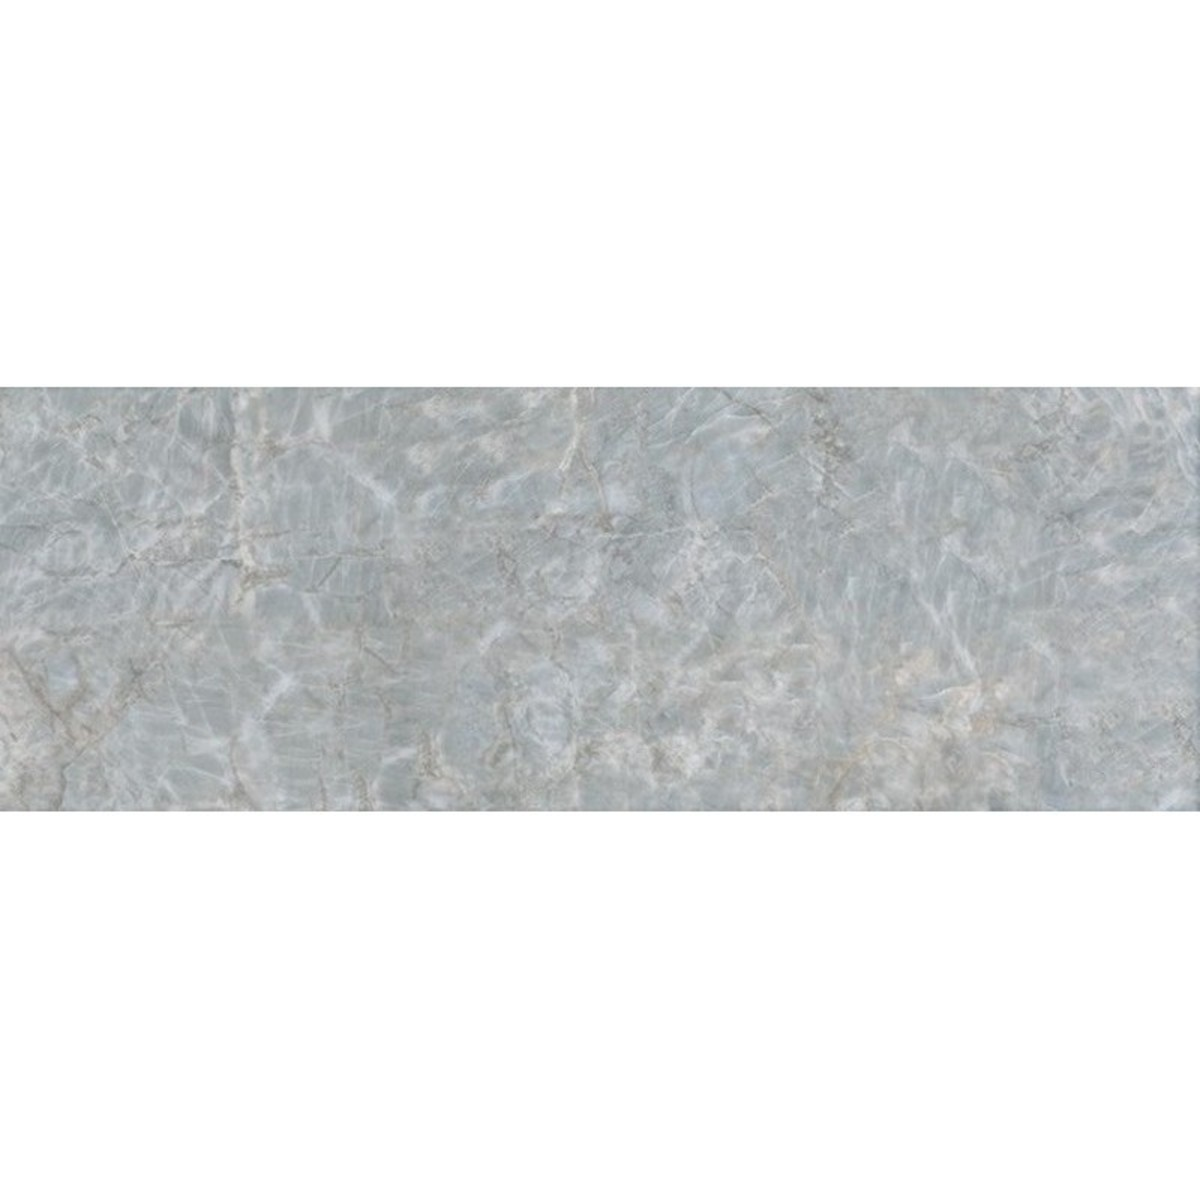 Плитка настенная Бертон цвет темно-серый 20х50 см 12 м2